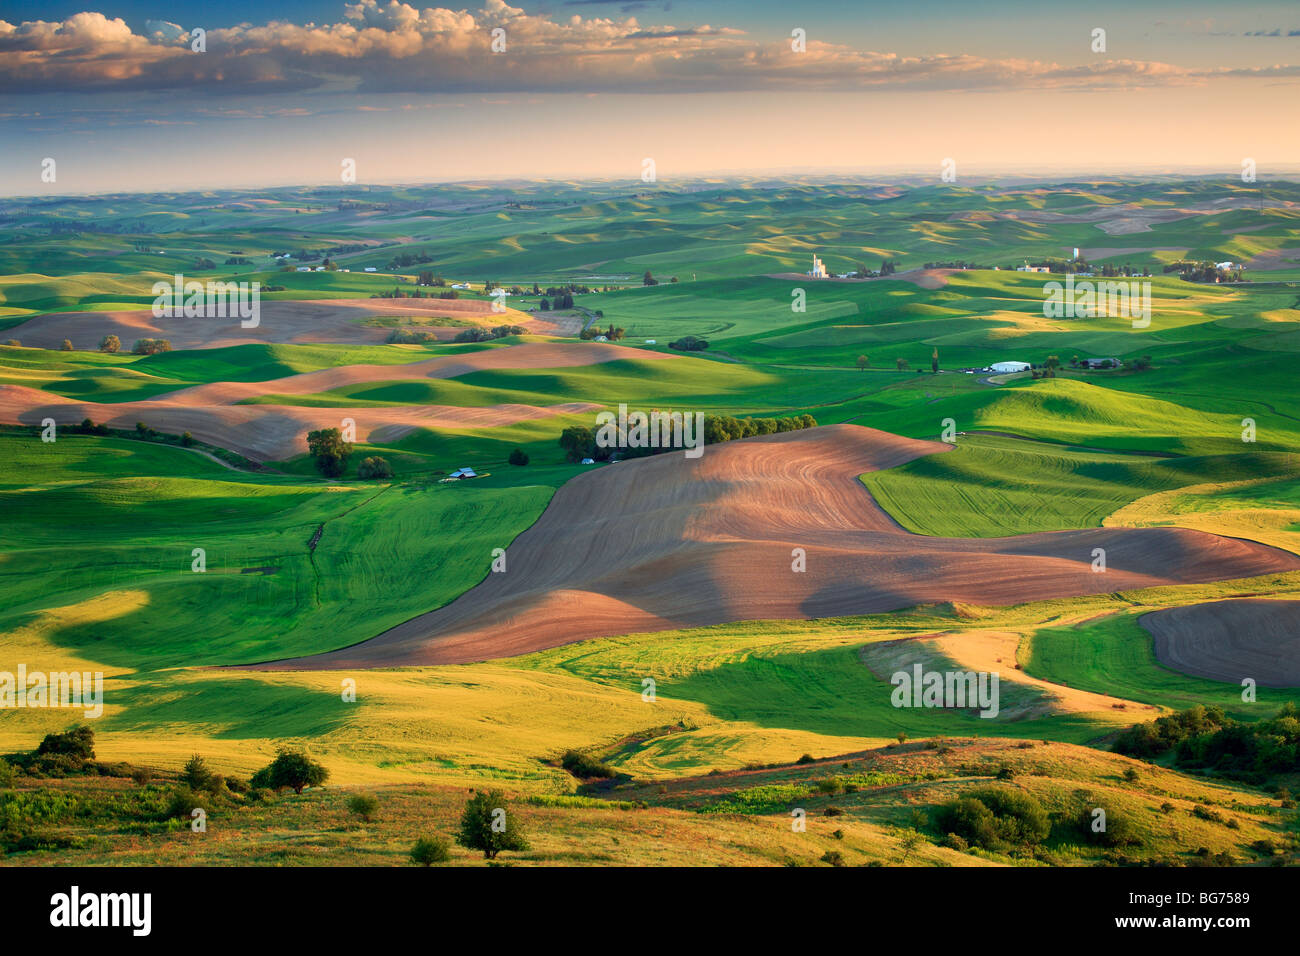 Los campos de cultivo que rodean Steptoe Butte en la zona de Eastern Washington Palouse Imagen De Stock